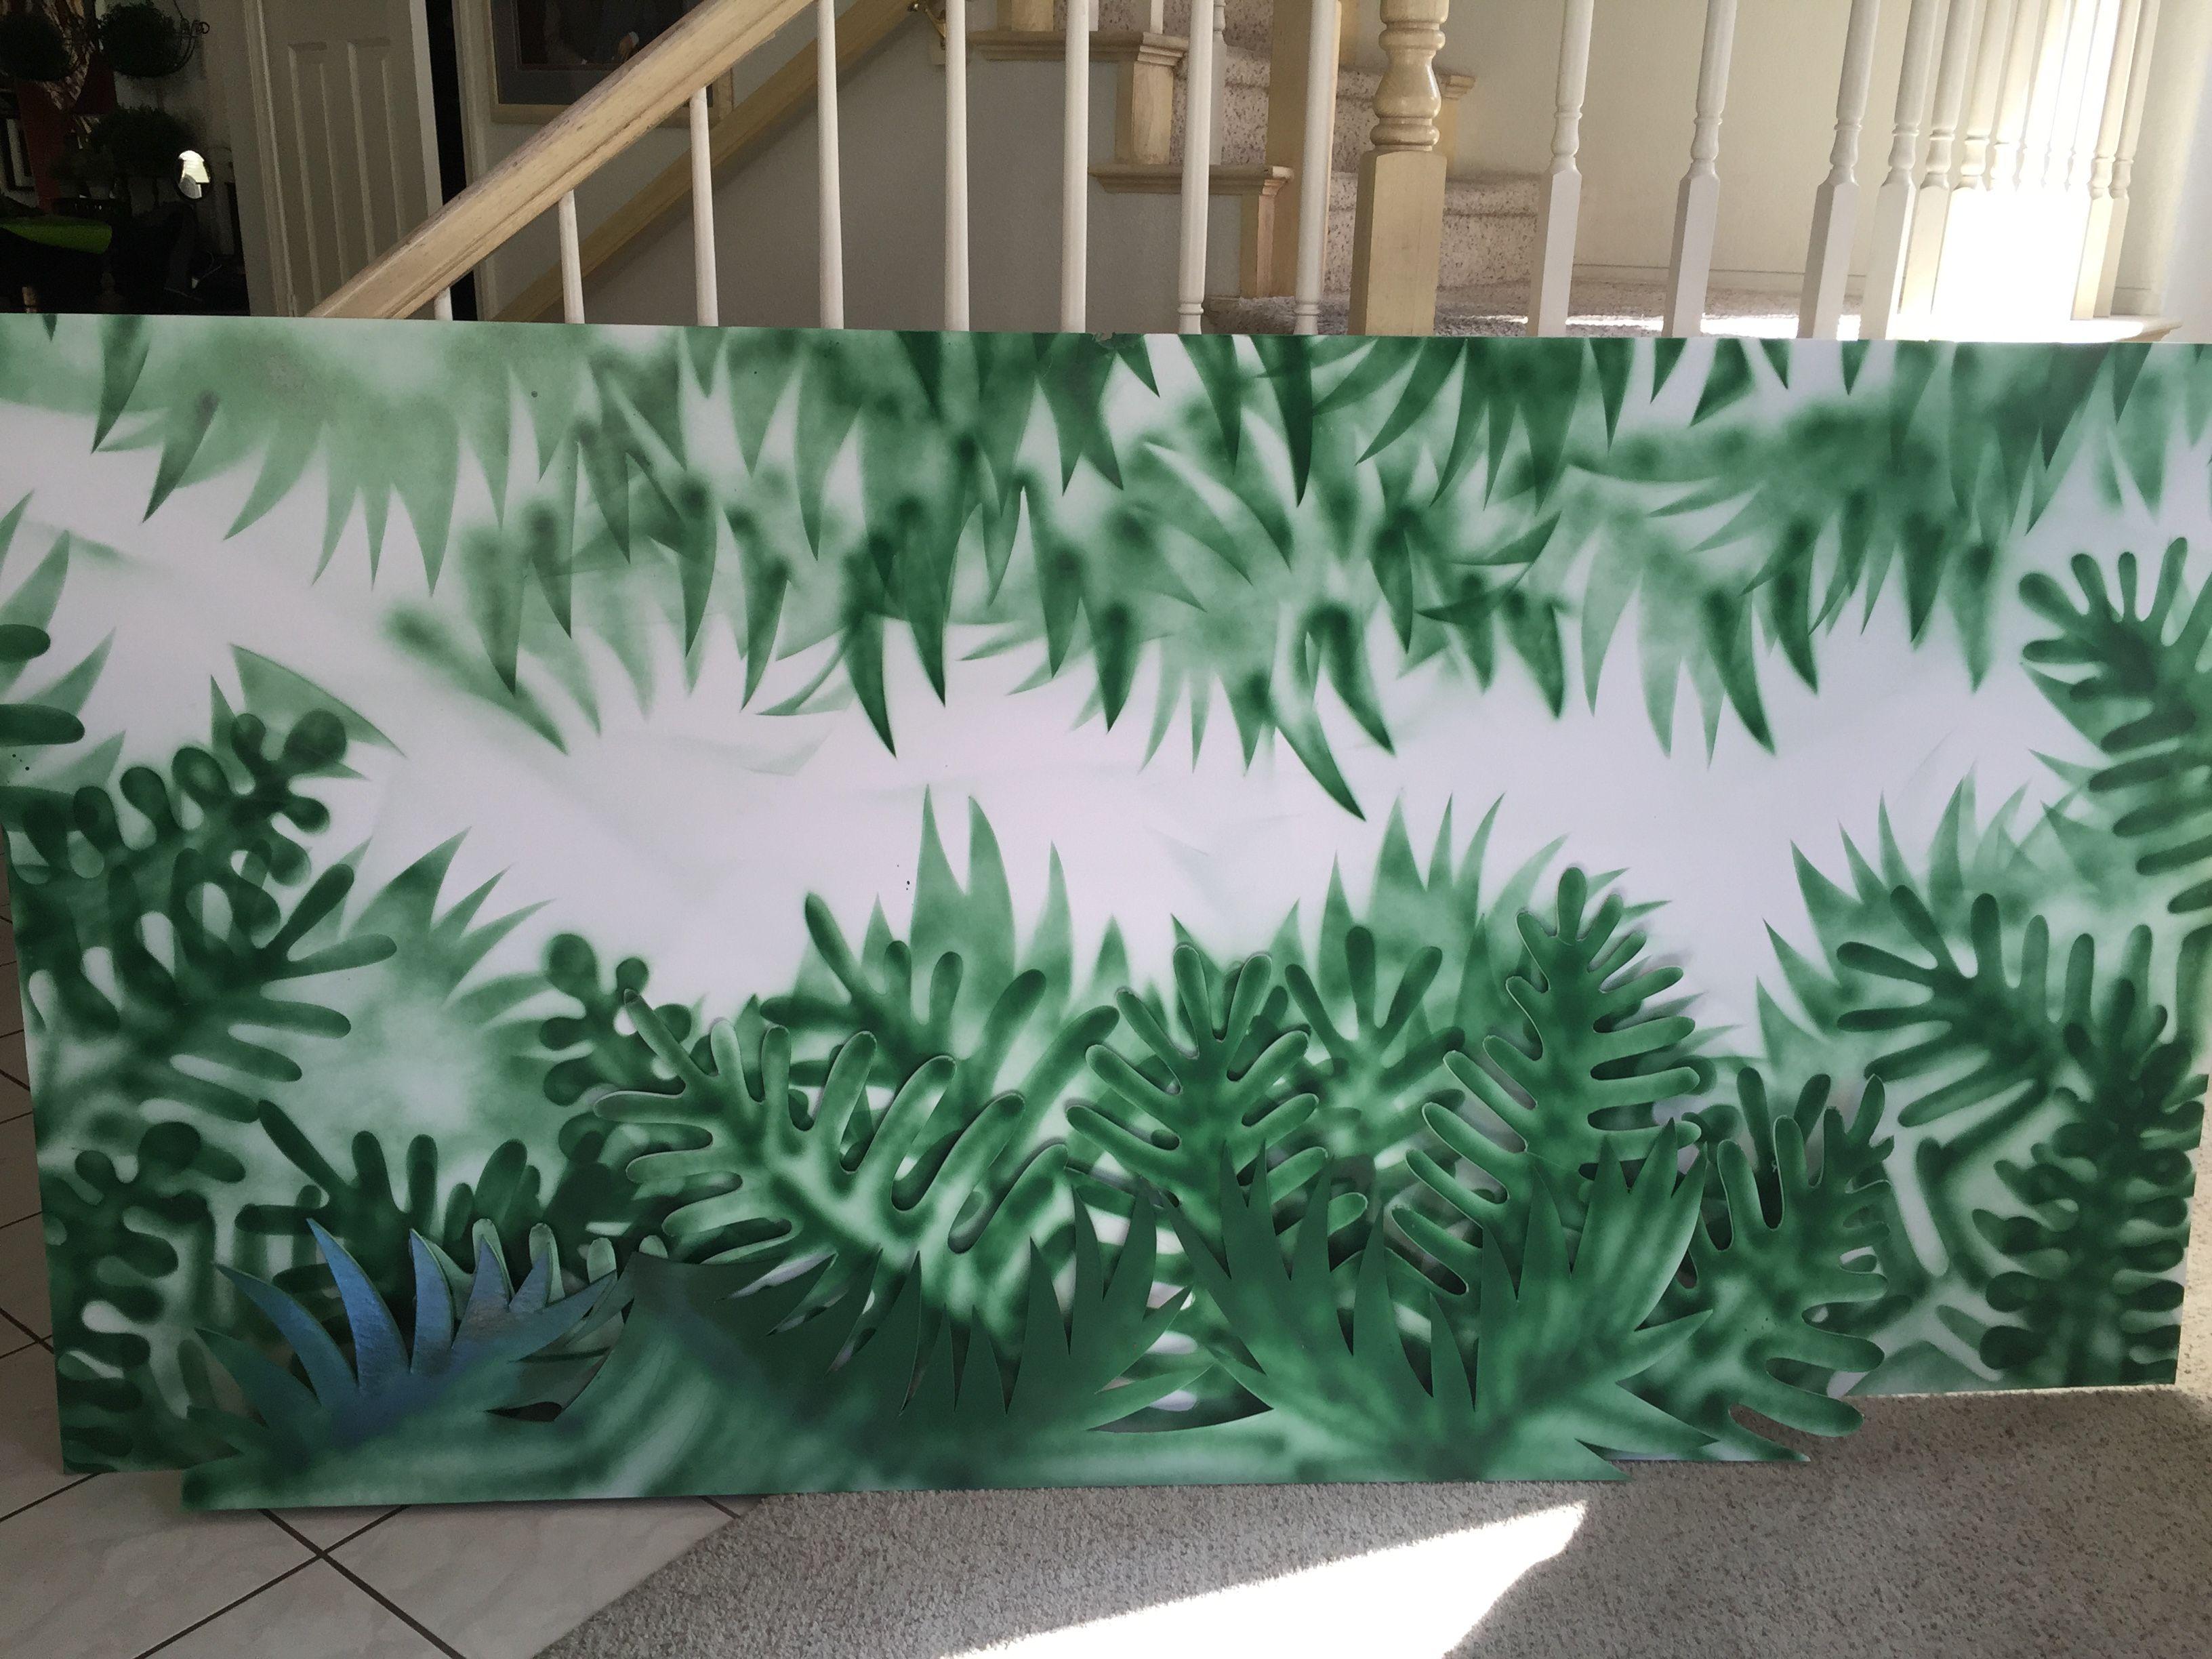 Magalie Sarnataros Props Jungle Vignette Tree And Leaves Spray Paint